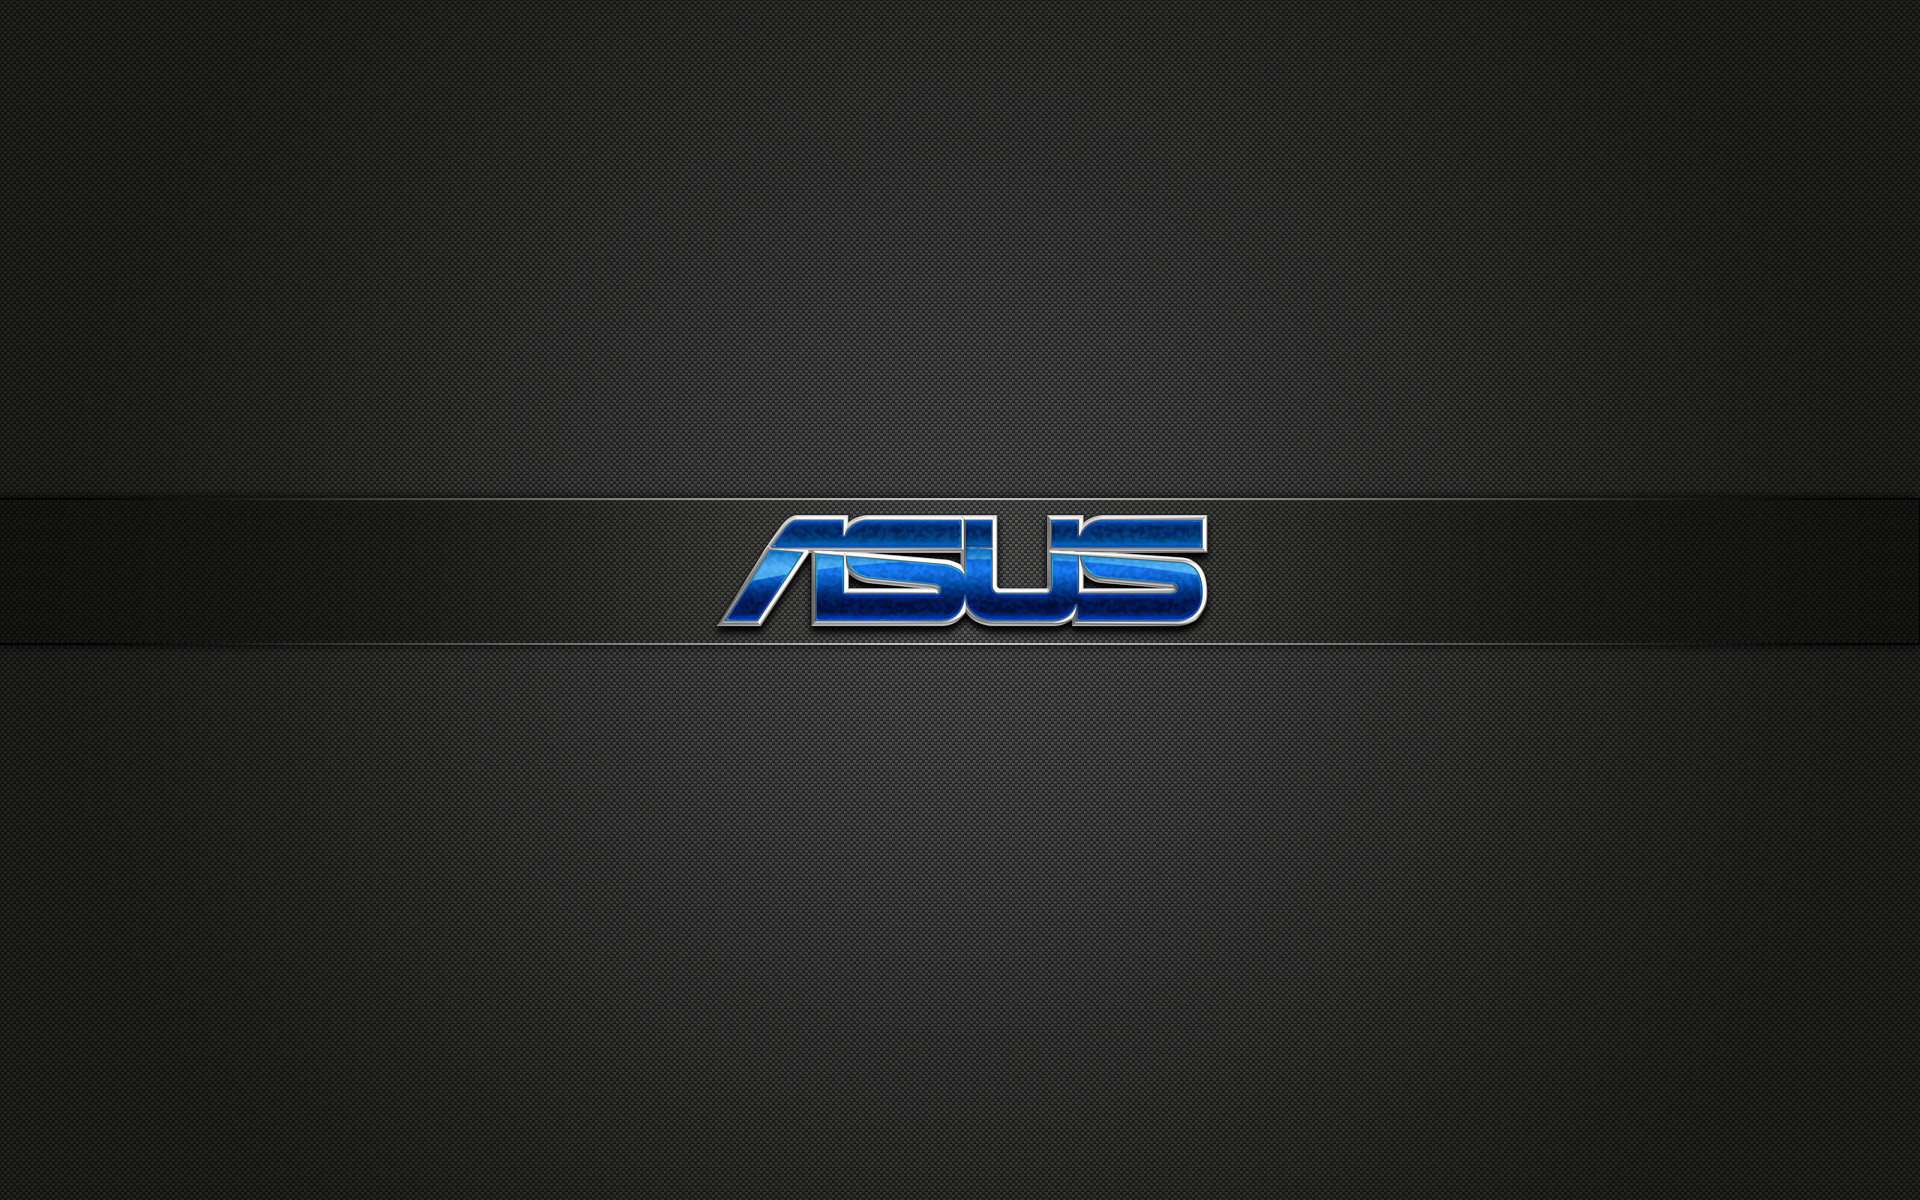 Asus HD Widescreen Wallpaper